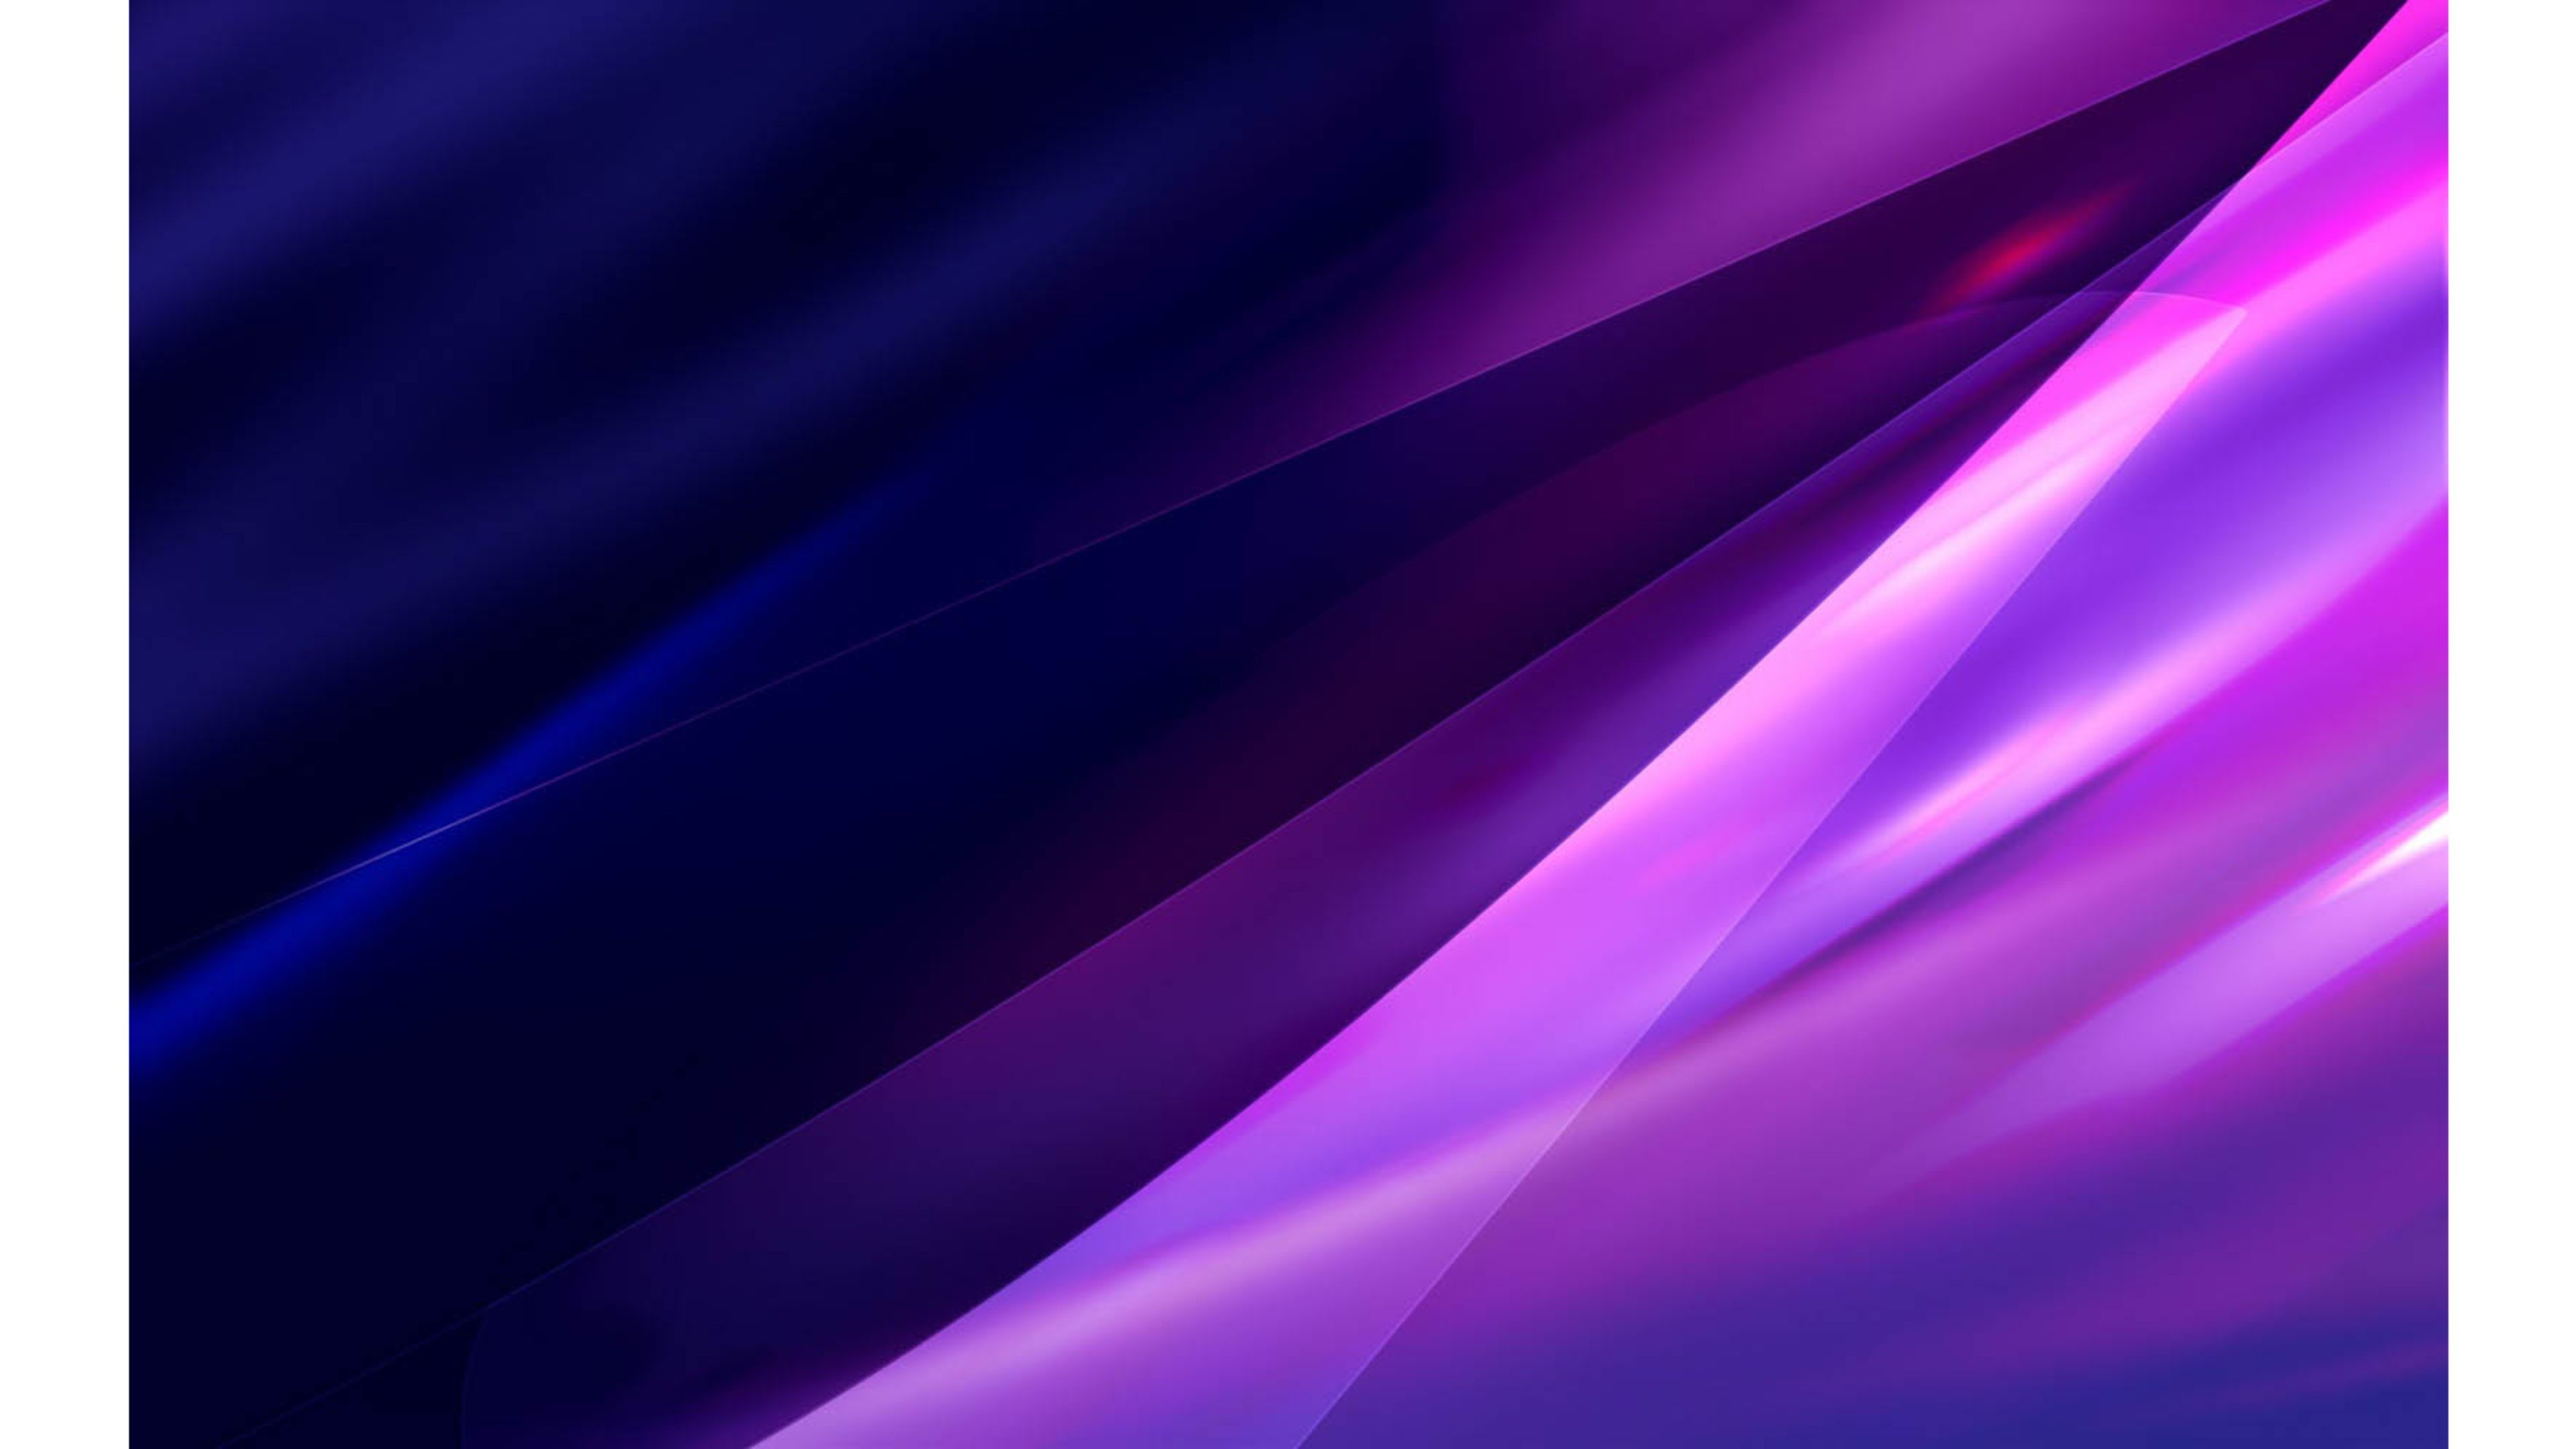 Purple Waves Abstract 4K Wallpaper | Free 4K Wallpaper